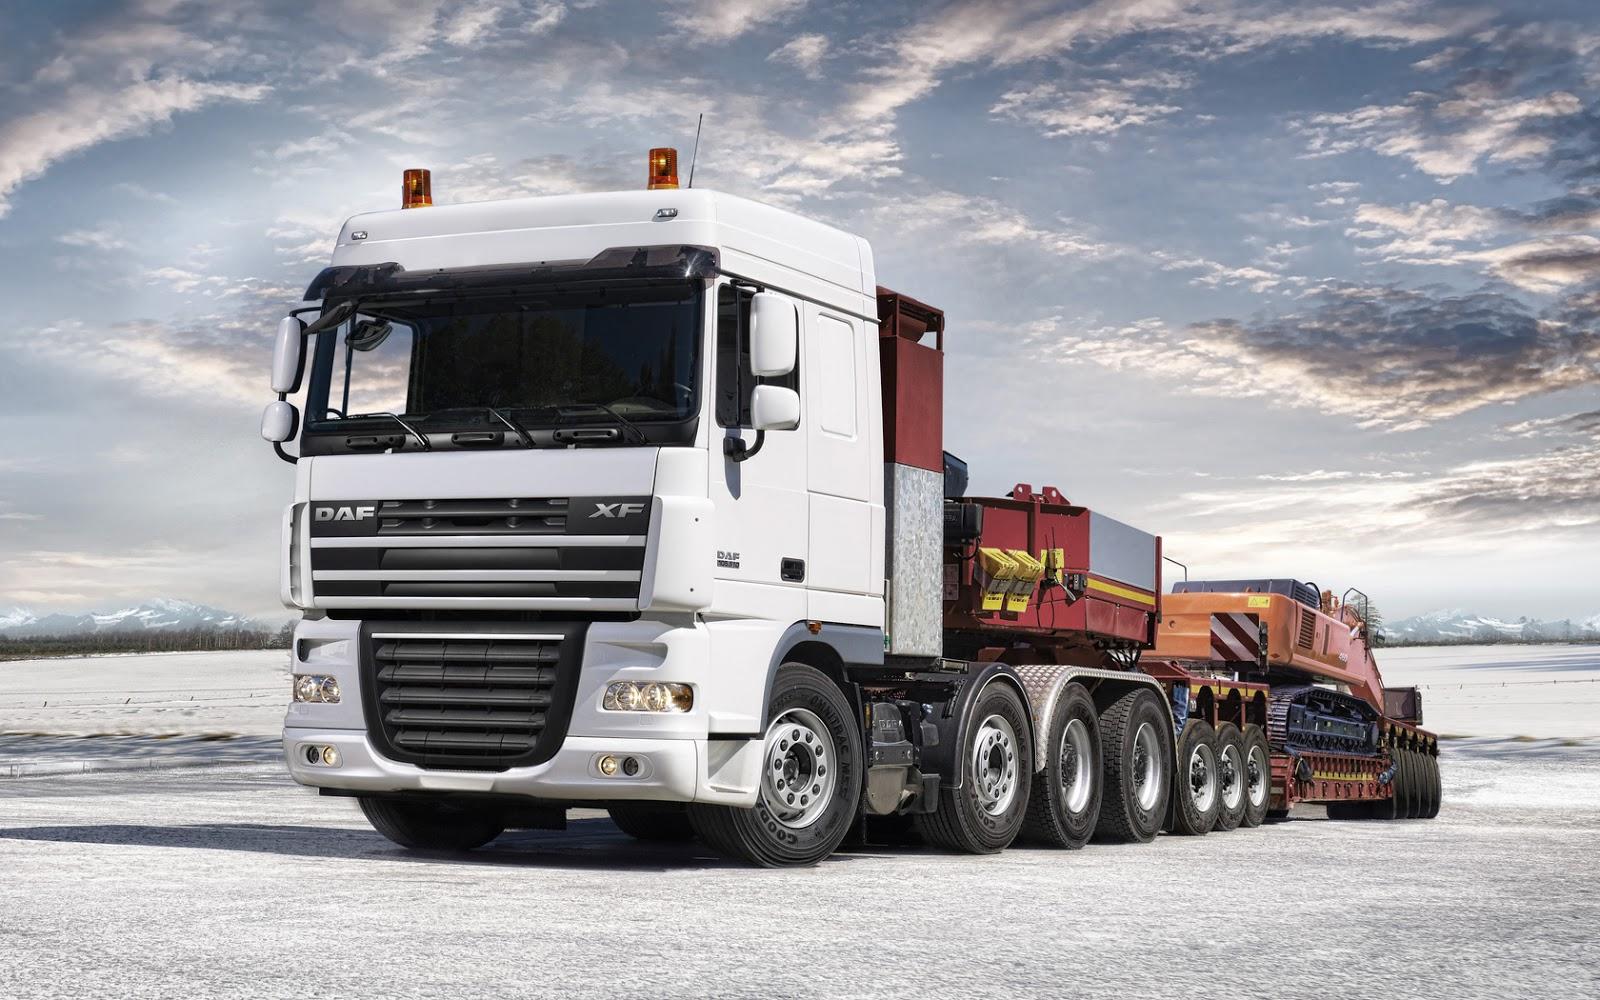 Ifa Truck Pics Hd: HD Car Wallpapers: Daf Trucks Canada Best Wallpapers